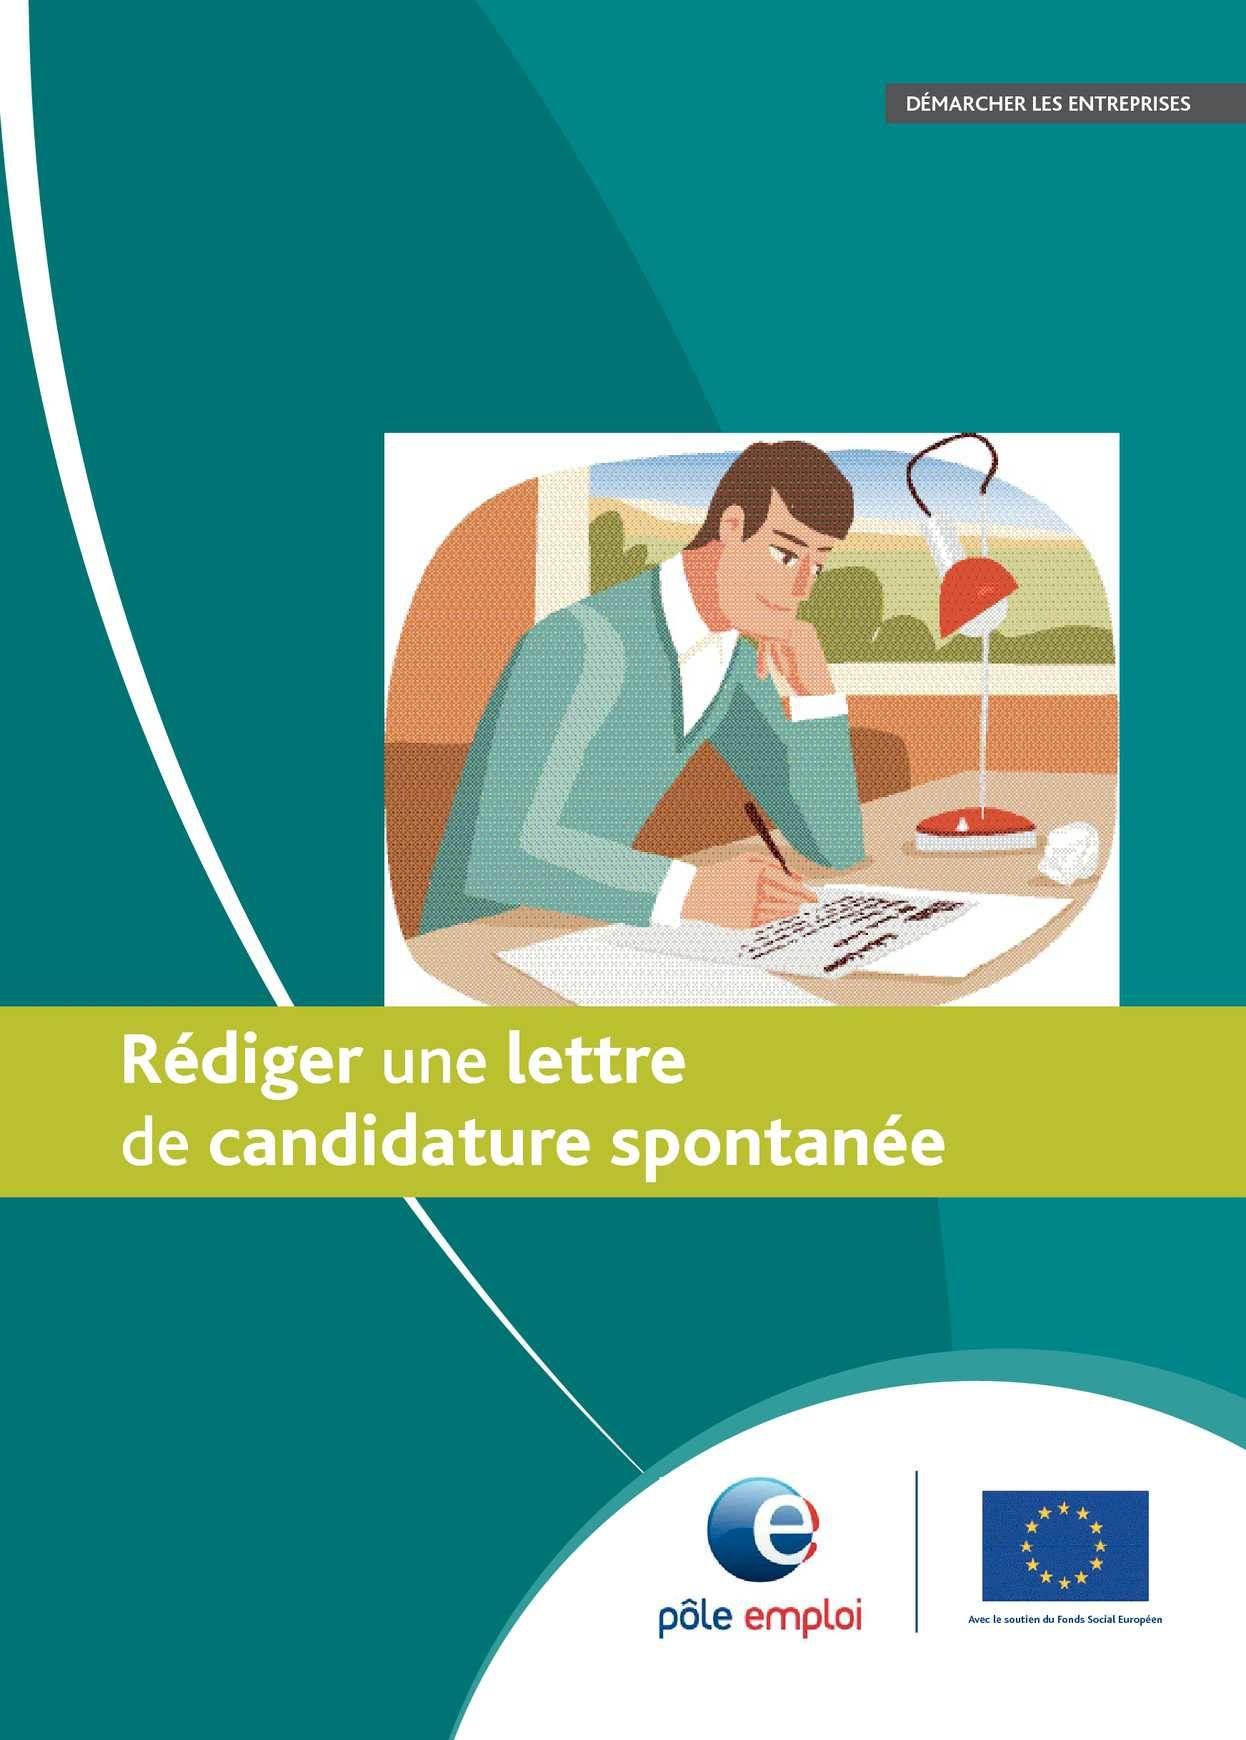 rediger une lettre de candidature spontanee